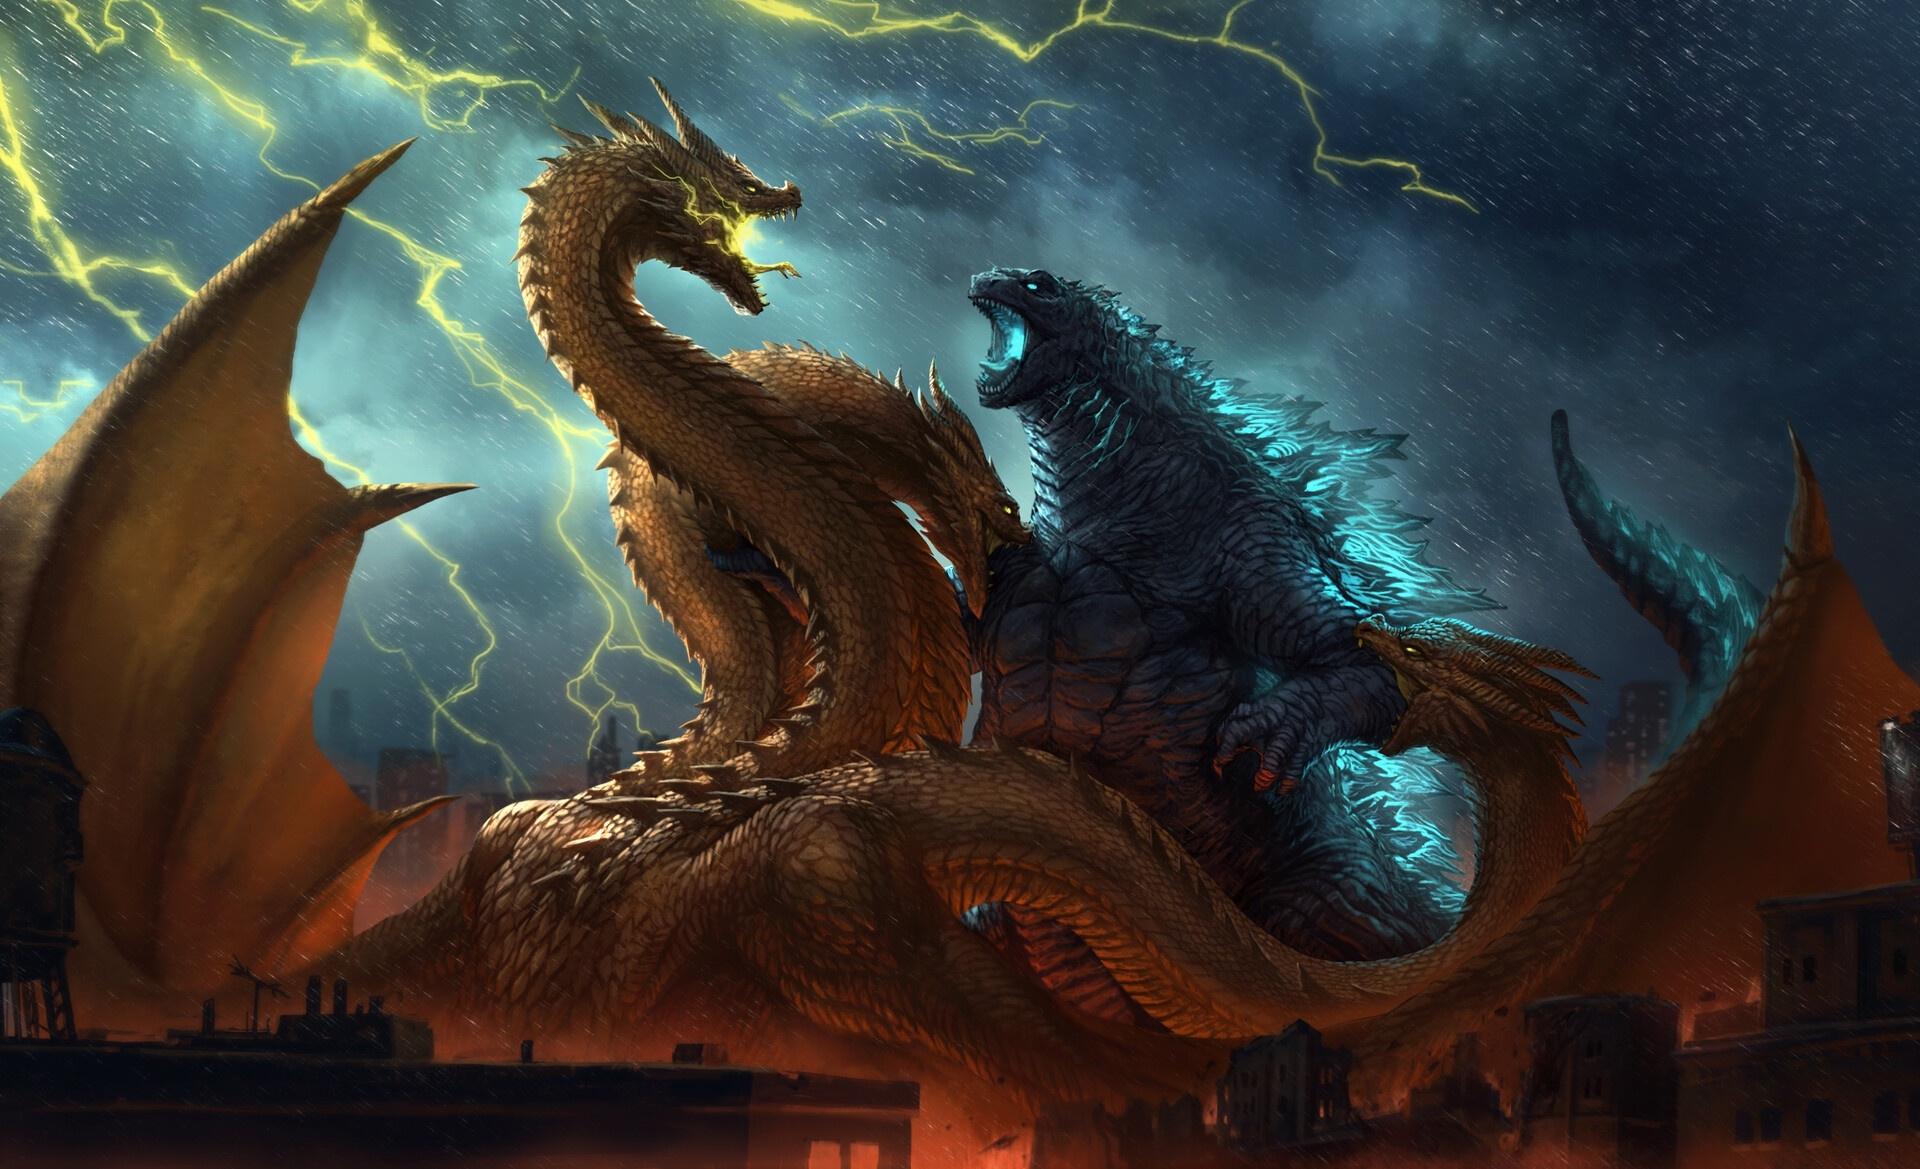 Godzilla vs King Ghidorah King of the Monsters Wallpaper HD 1920x1169